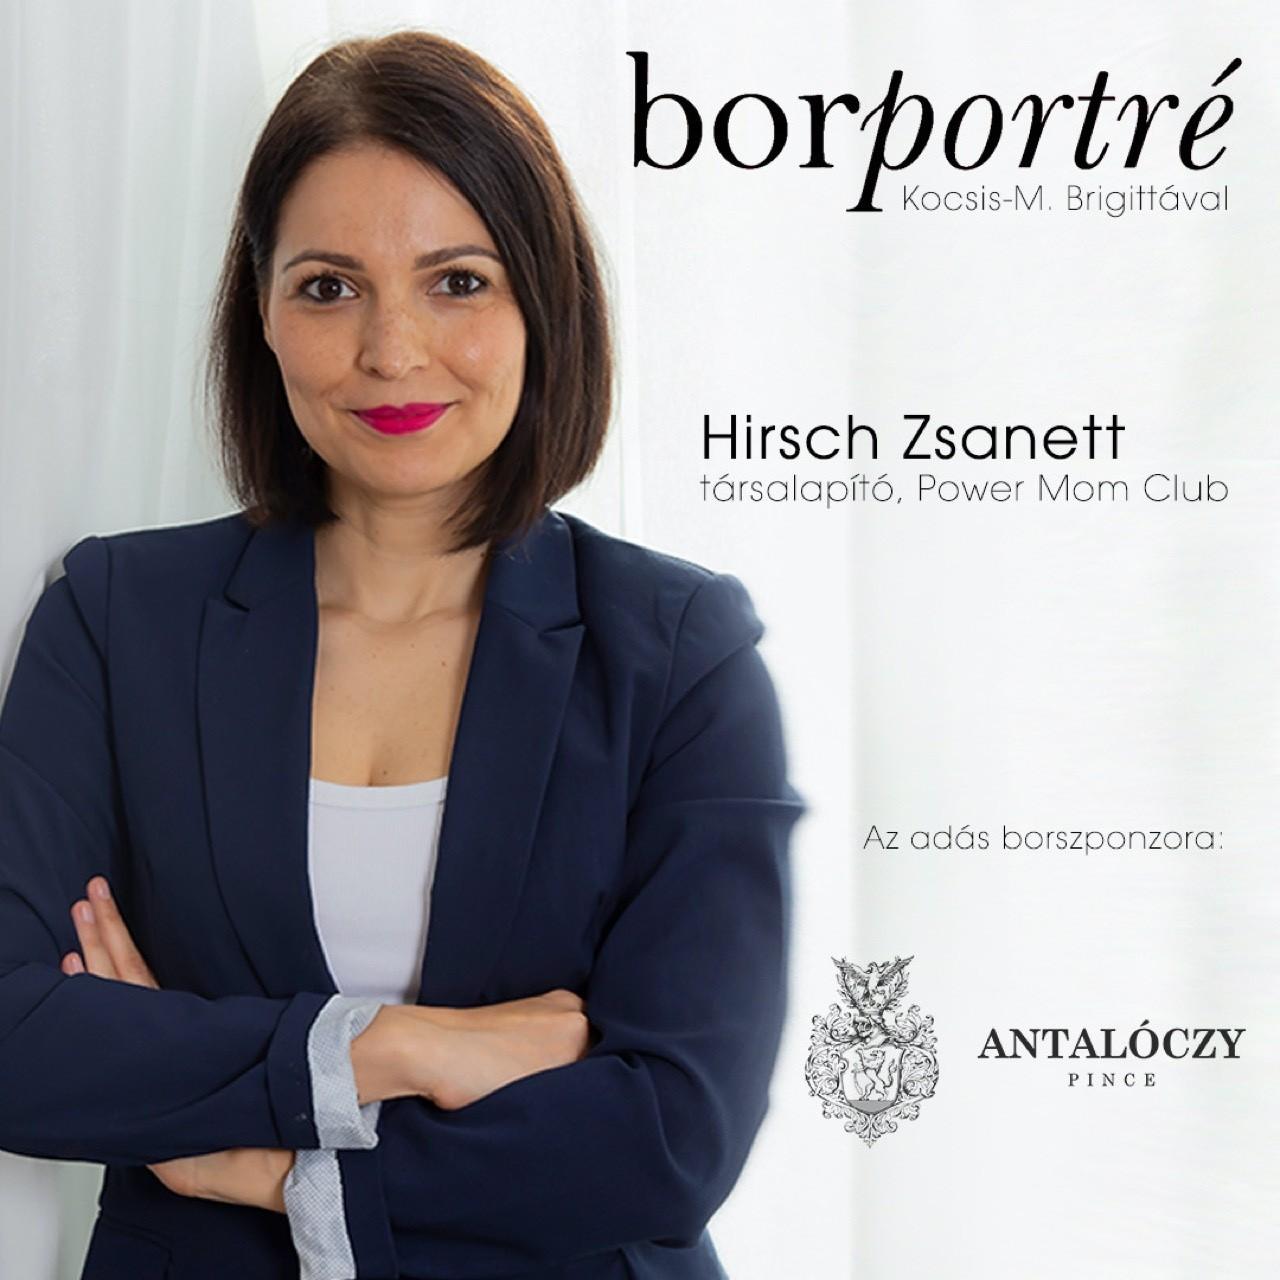 borportre_2021_03_24_hirsch_zsanett_power_mom_club_antaloczy_kocka